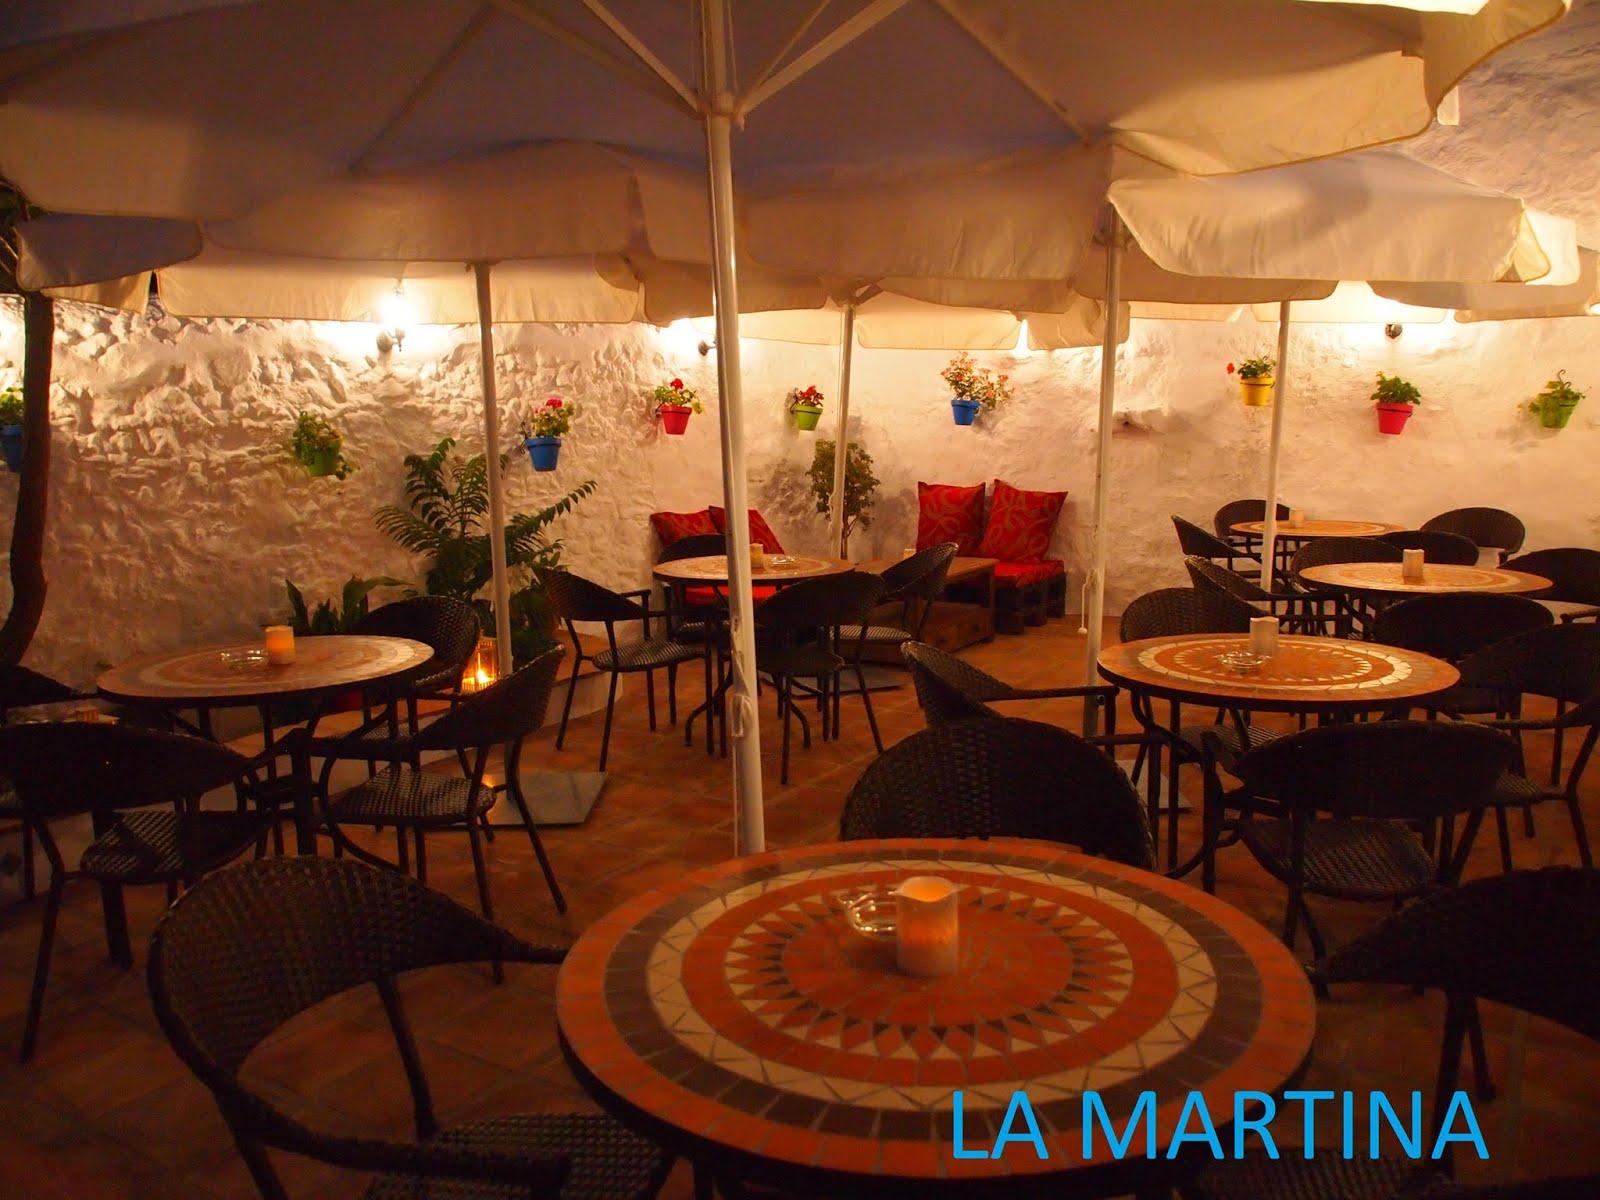 Restaurante La Martina